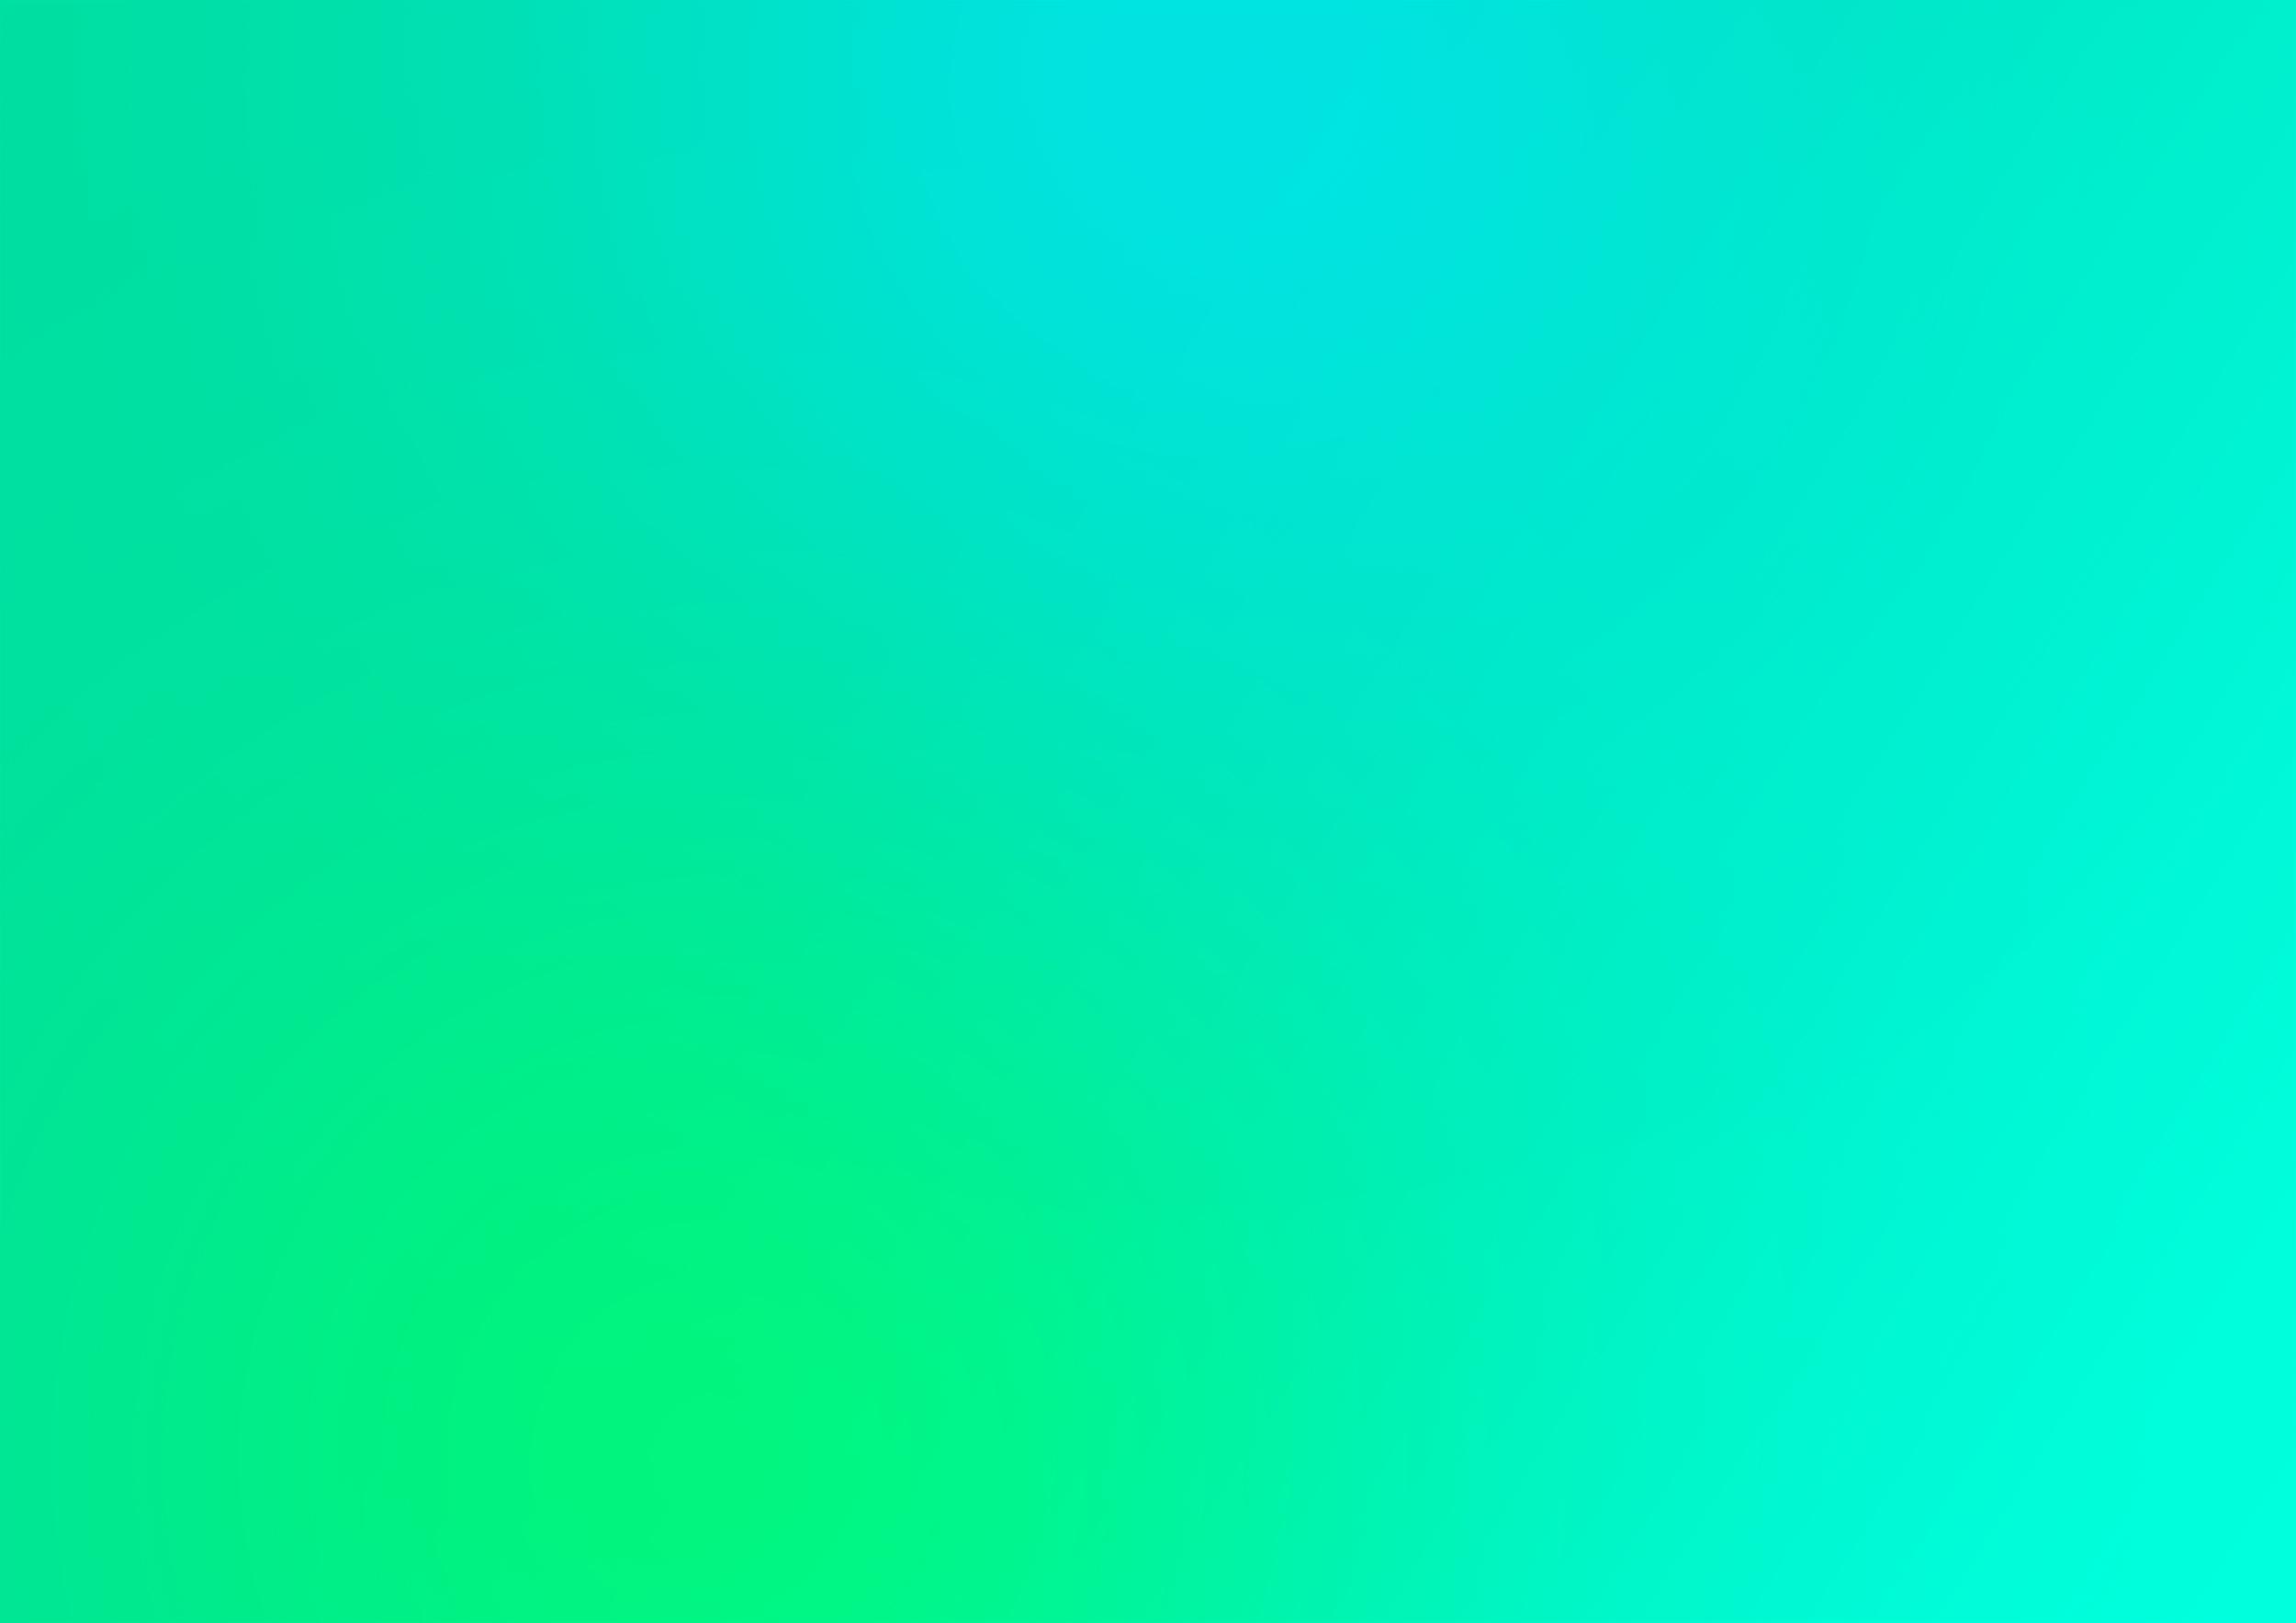 Apple Ios Wallpaper Hd Appandabout Desarrollo De Aplicaciones M 243 Viles Android E